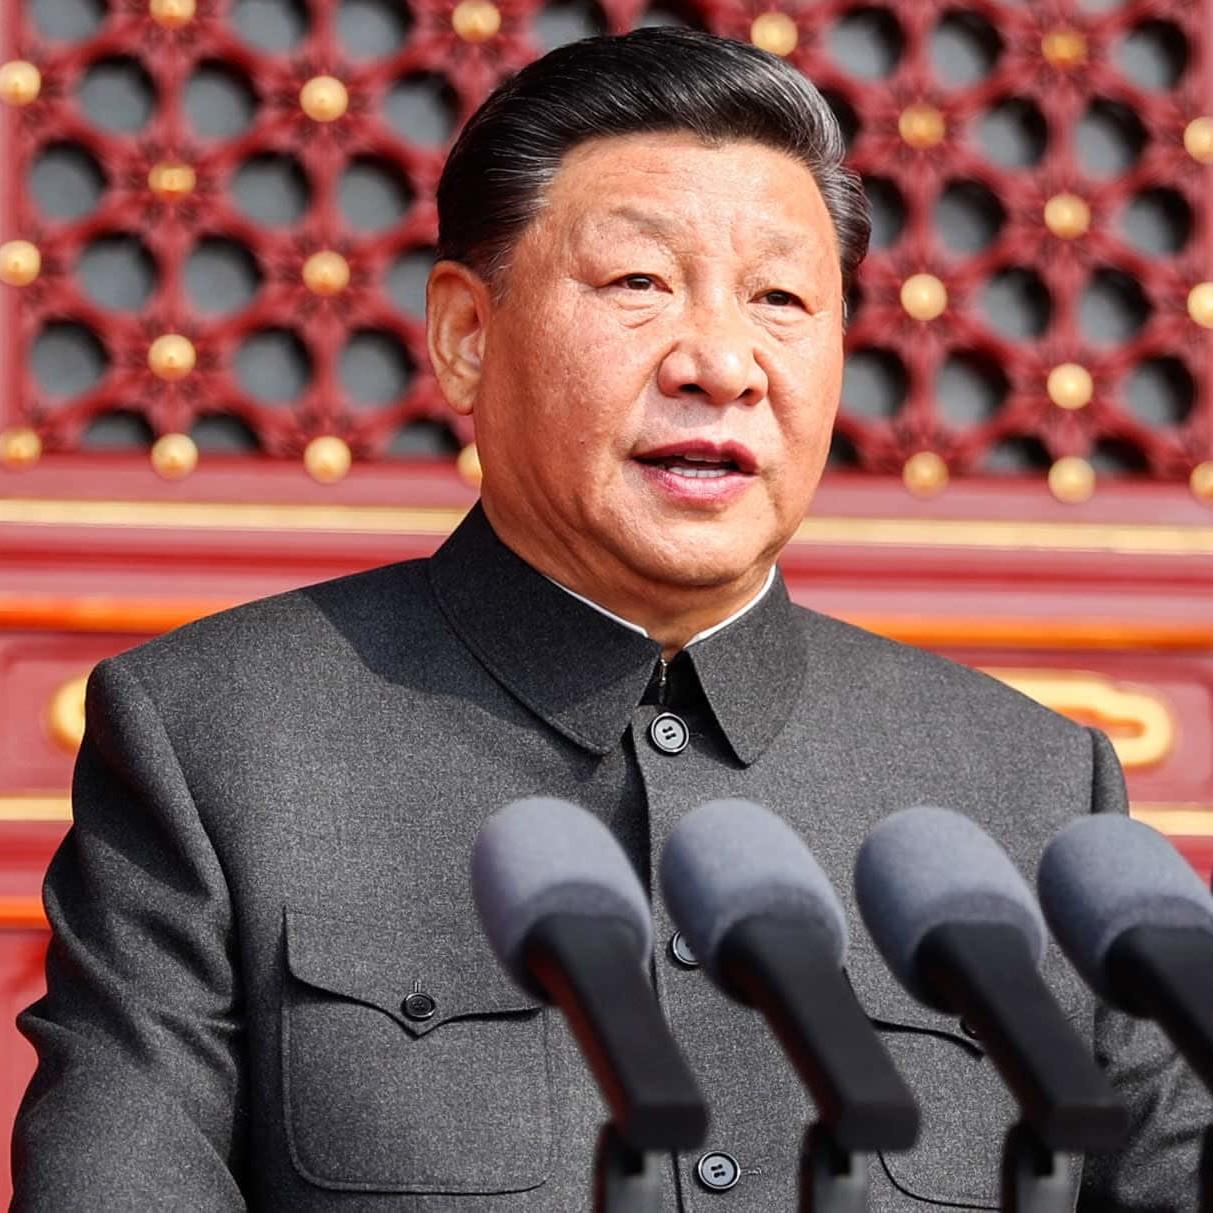 La piaga del virus cambierà la Cina?